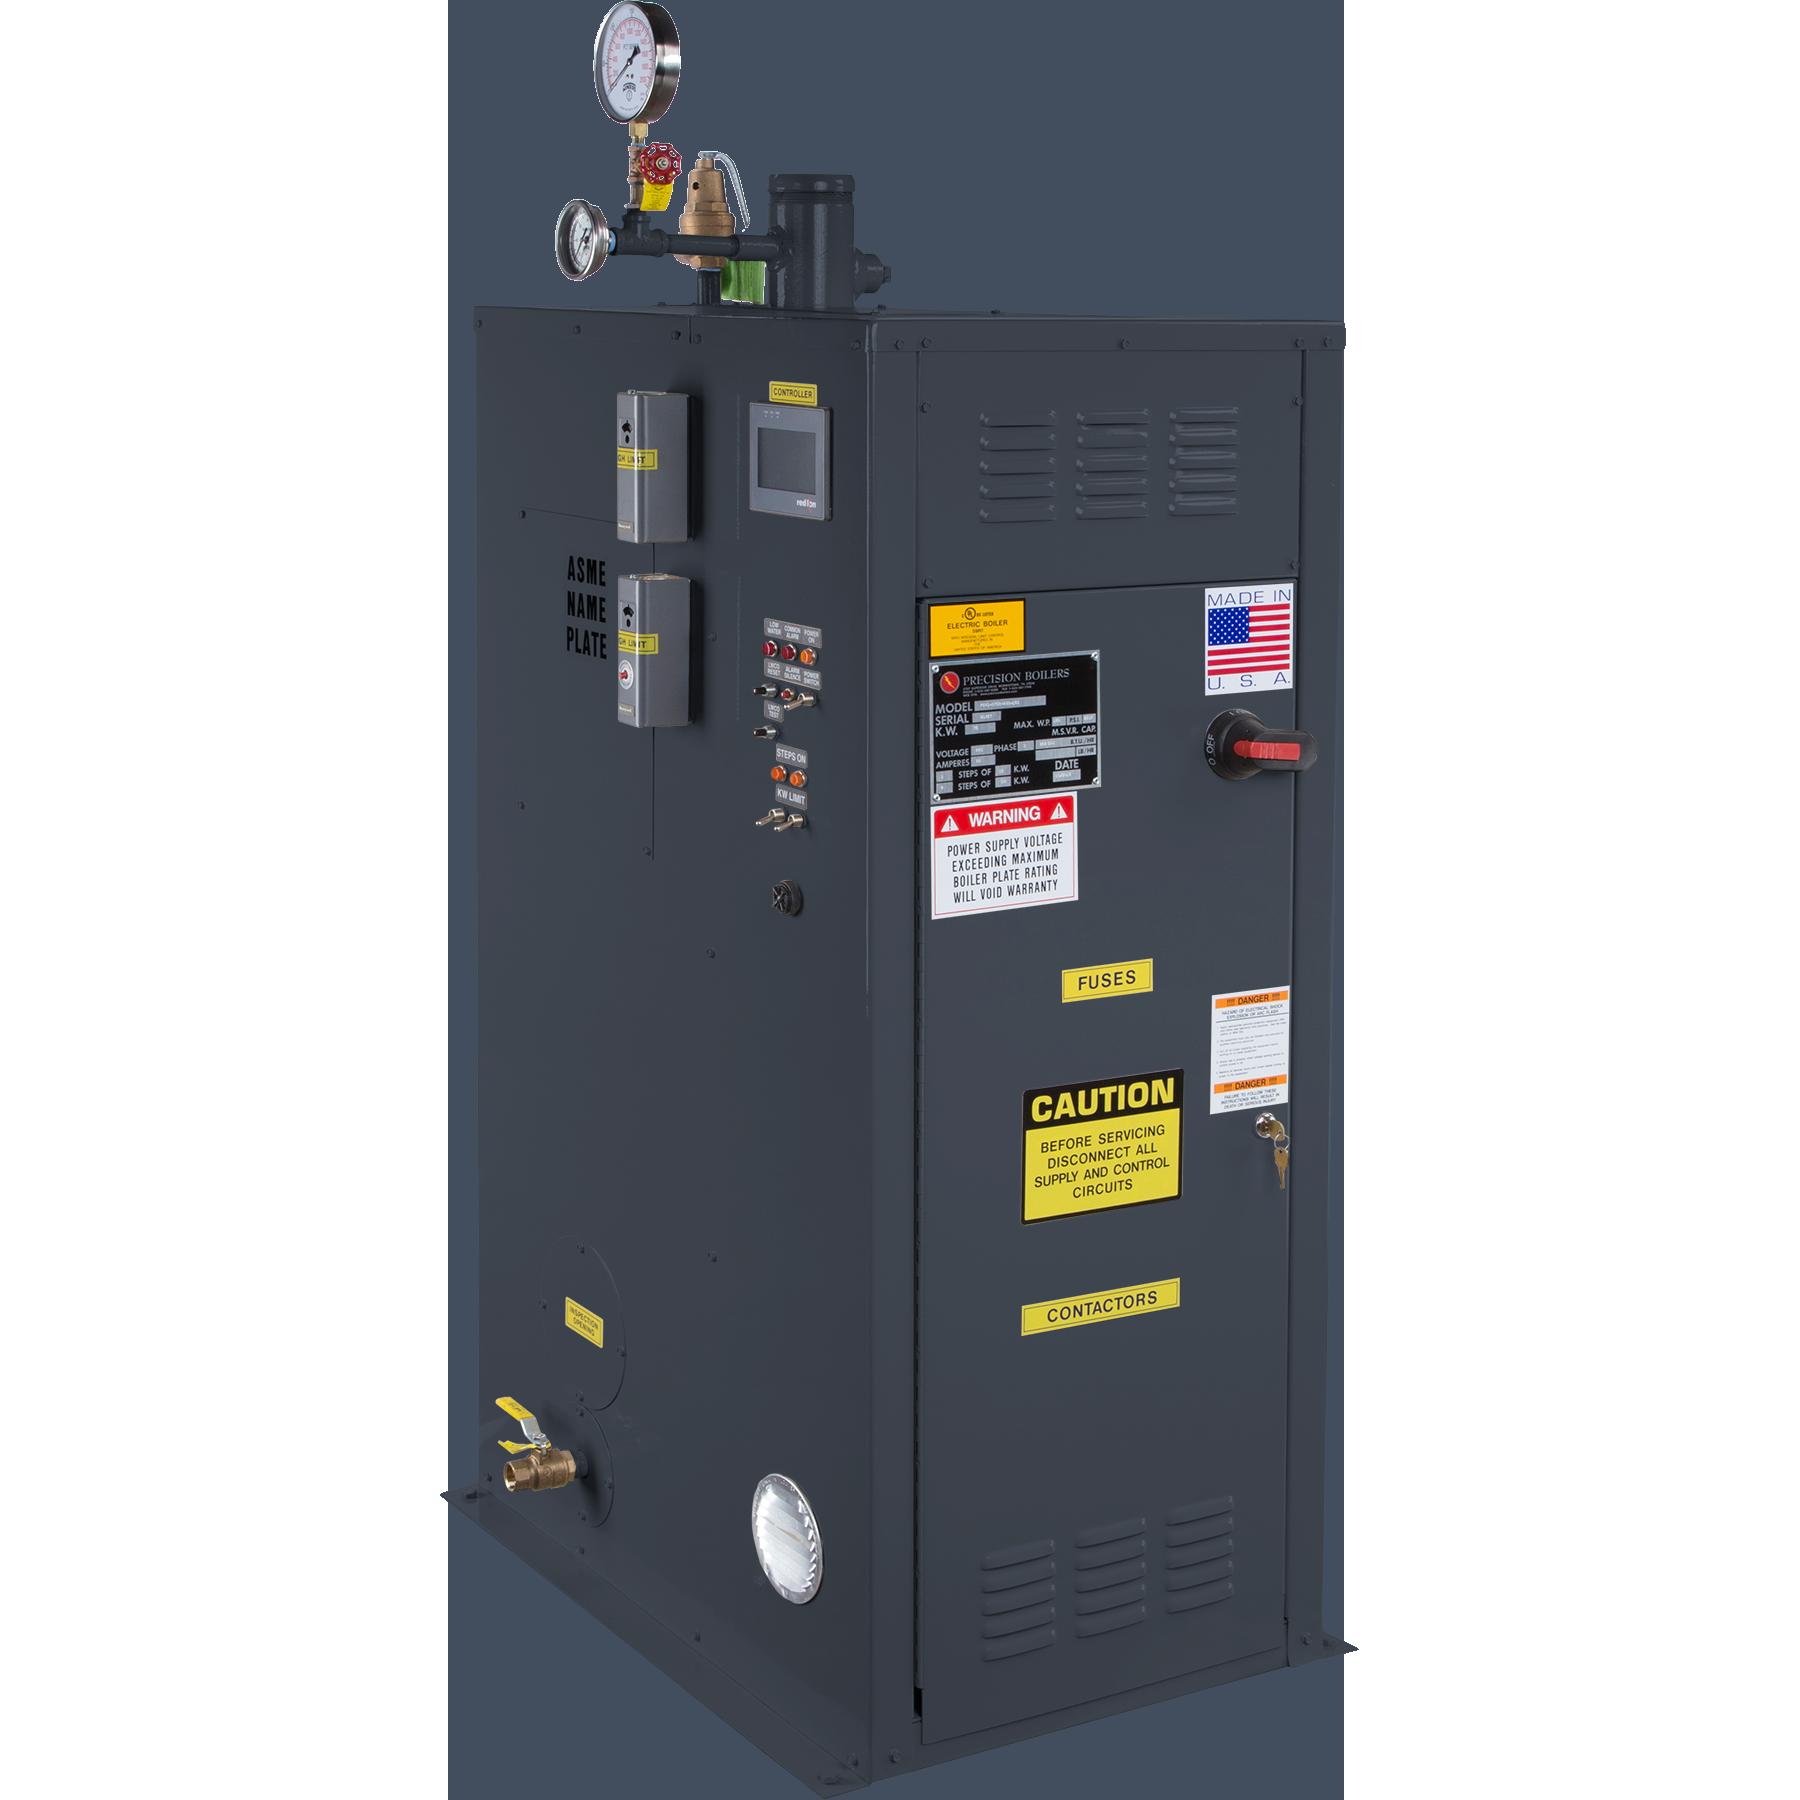 Model PCW Electric Hot Water Boiler